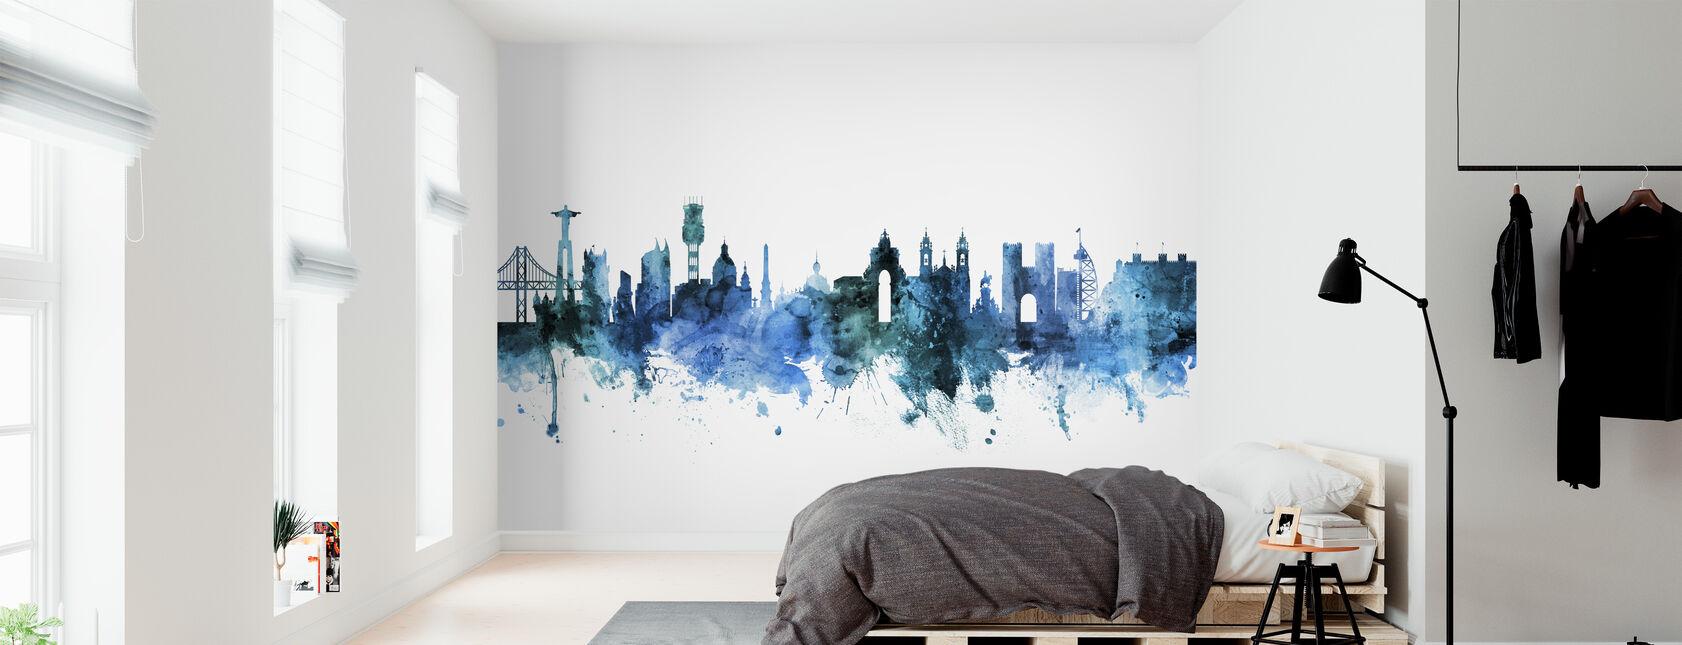 Lisbon Portugal Skyline - Wallpaper - Bedroom